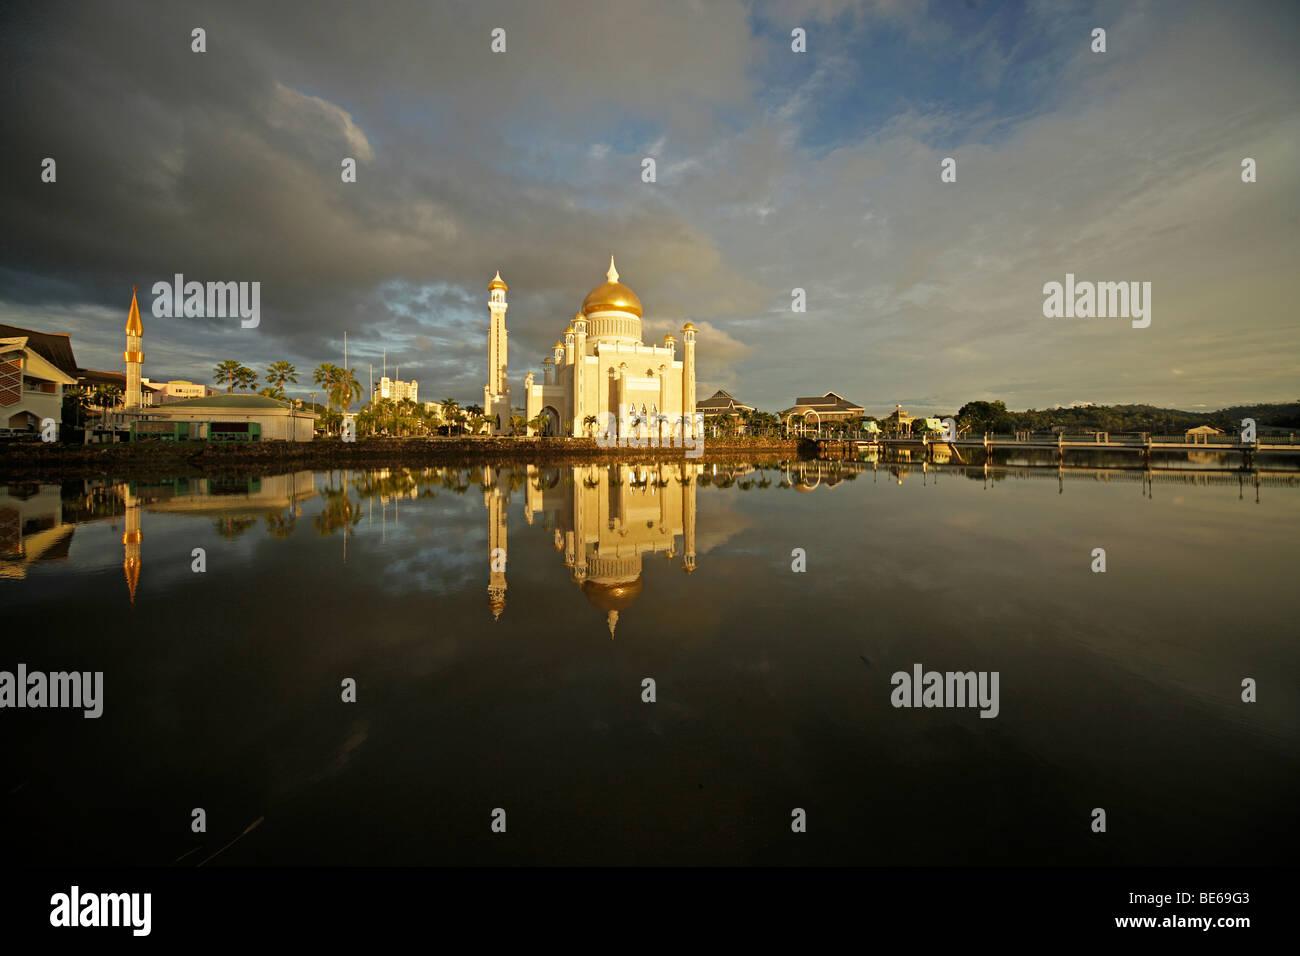 Royal Mosque of Sultan Omar Ali Saifuddin reflected in a lagoon in the capital city, Bandar Seri Begawan, Brunei, - Stock Image